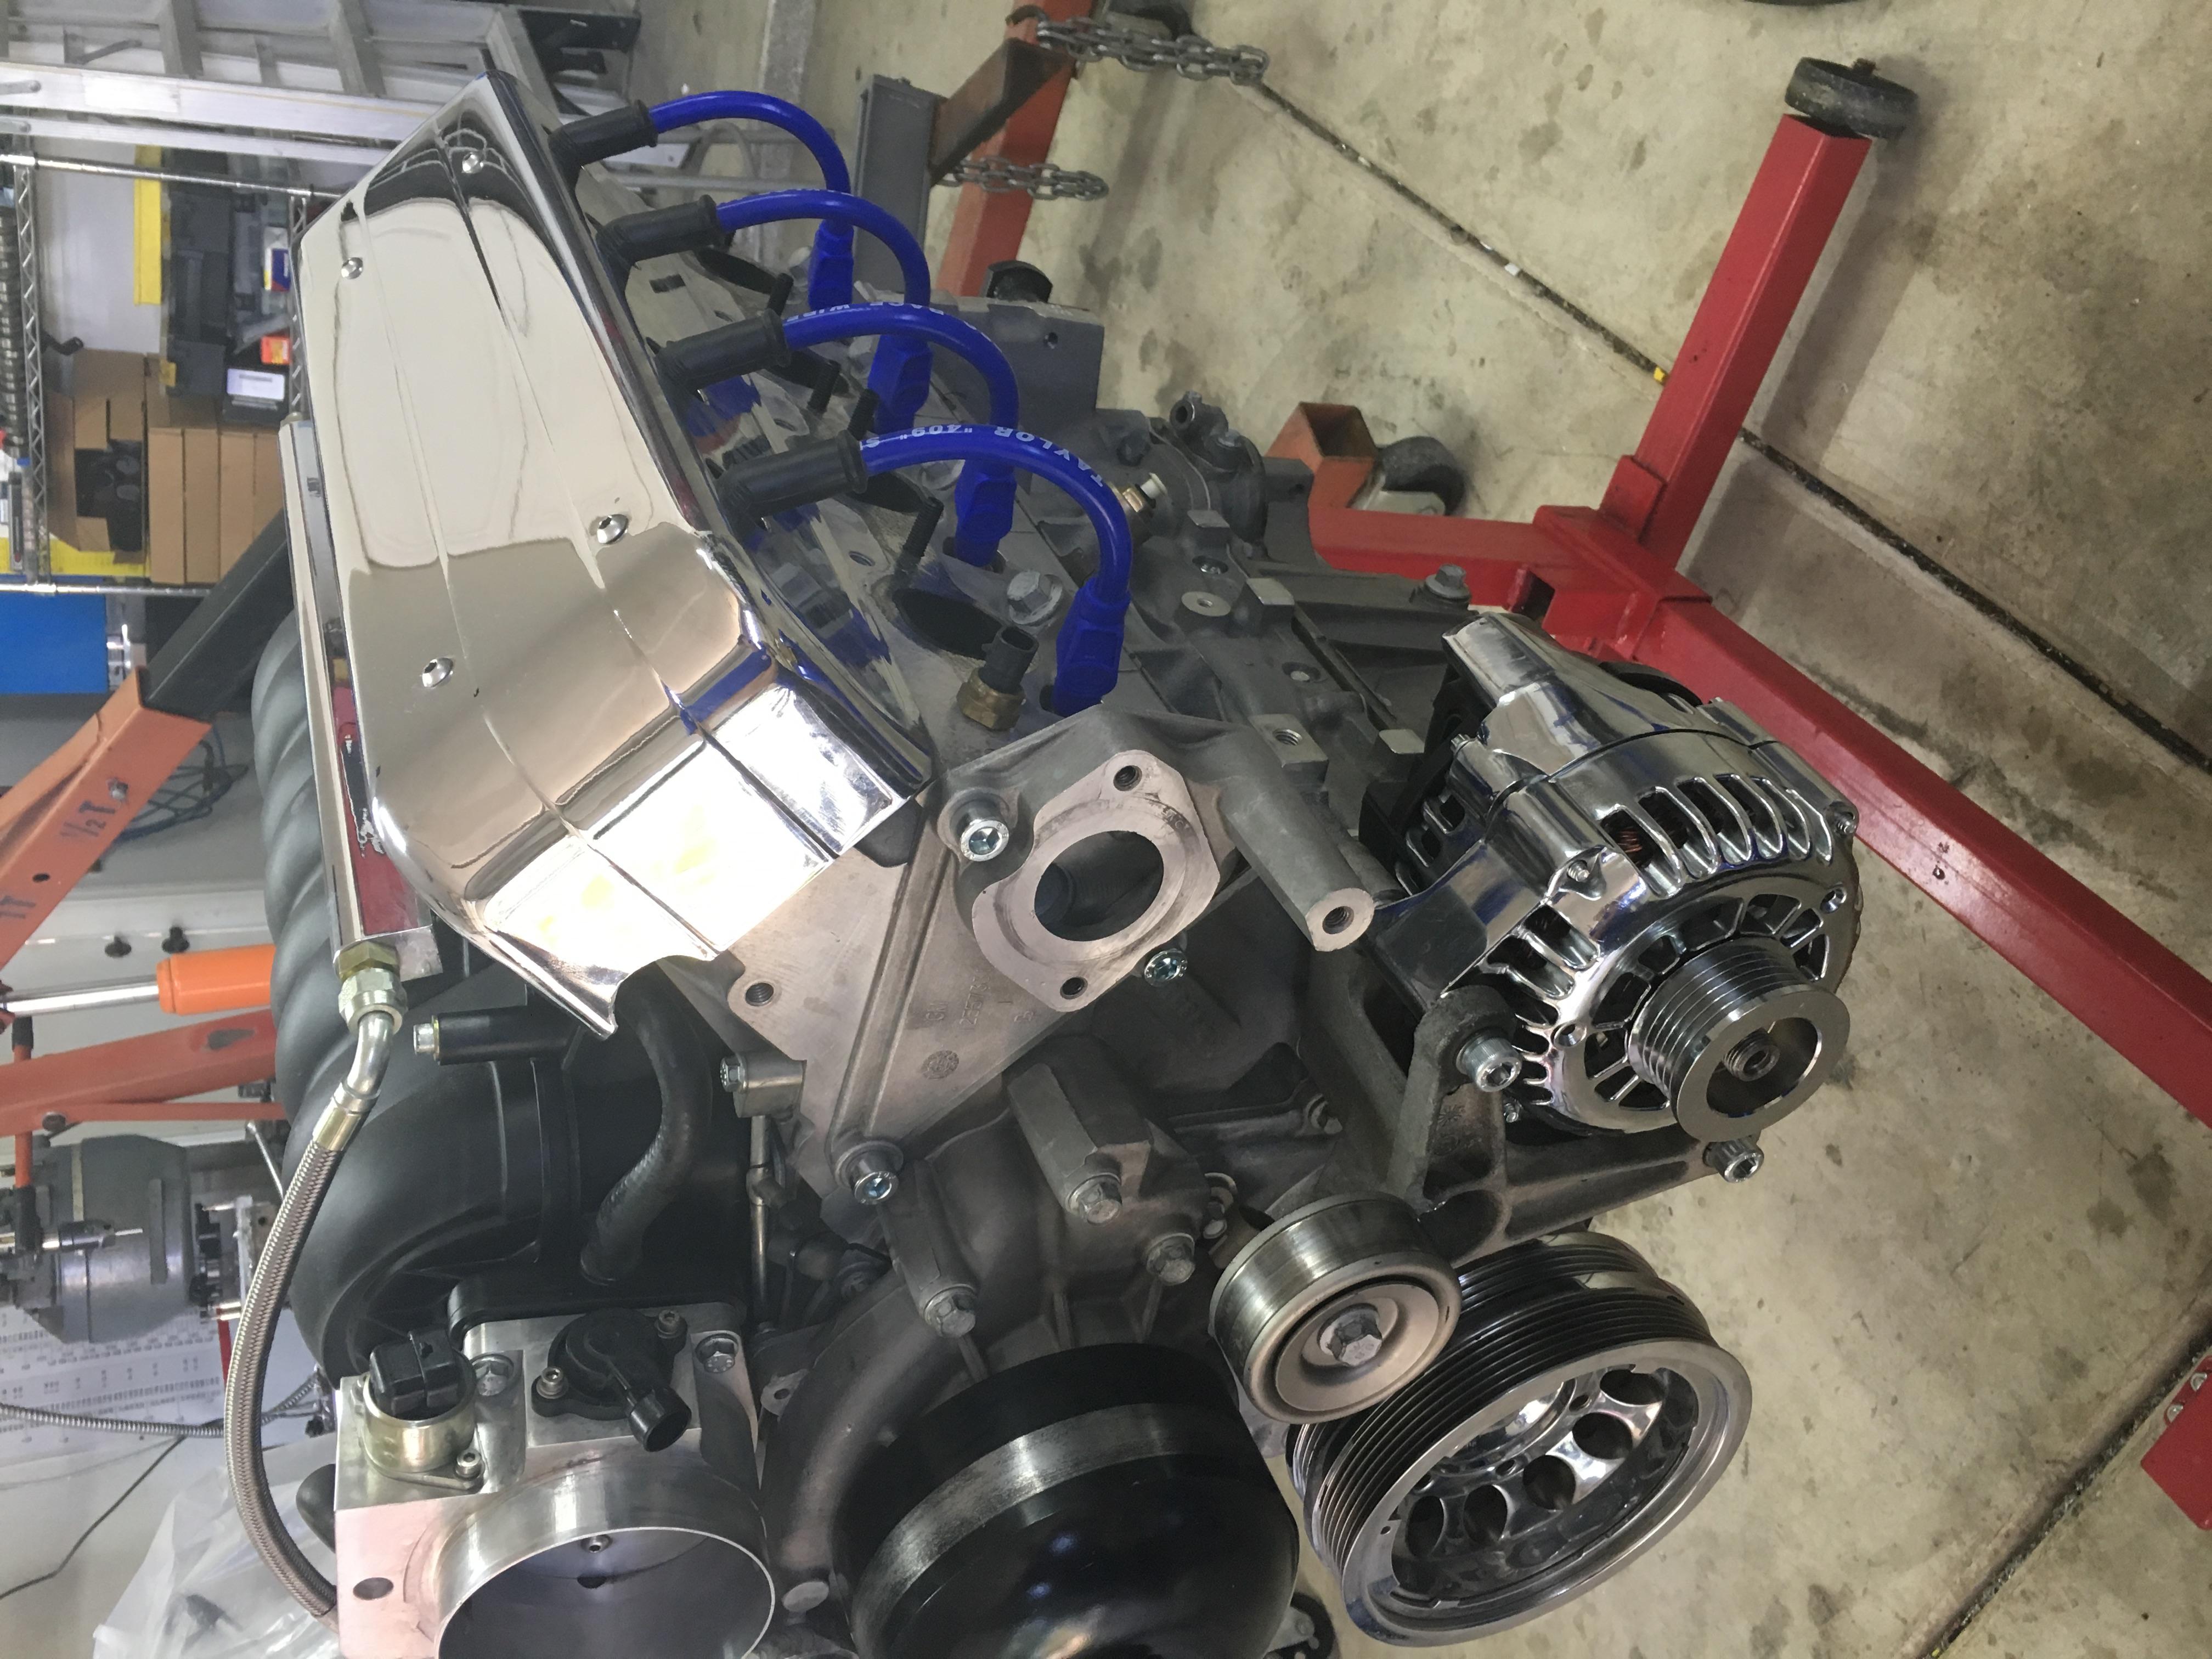 408 CI Turnkey LS2 $6200 - Sandrail Parts - Dumont Dune Riders